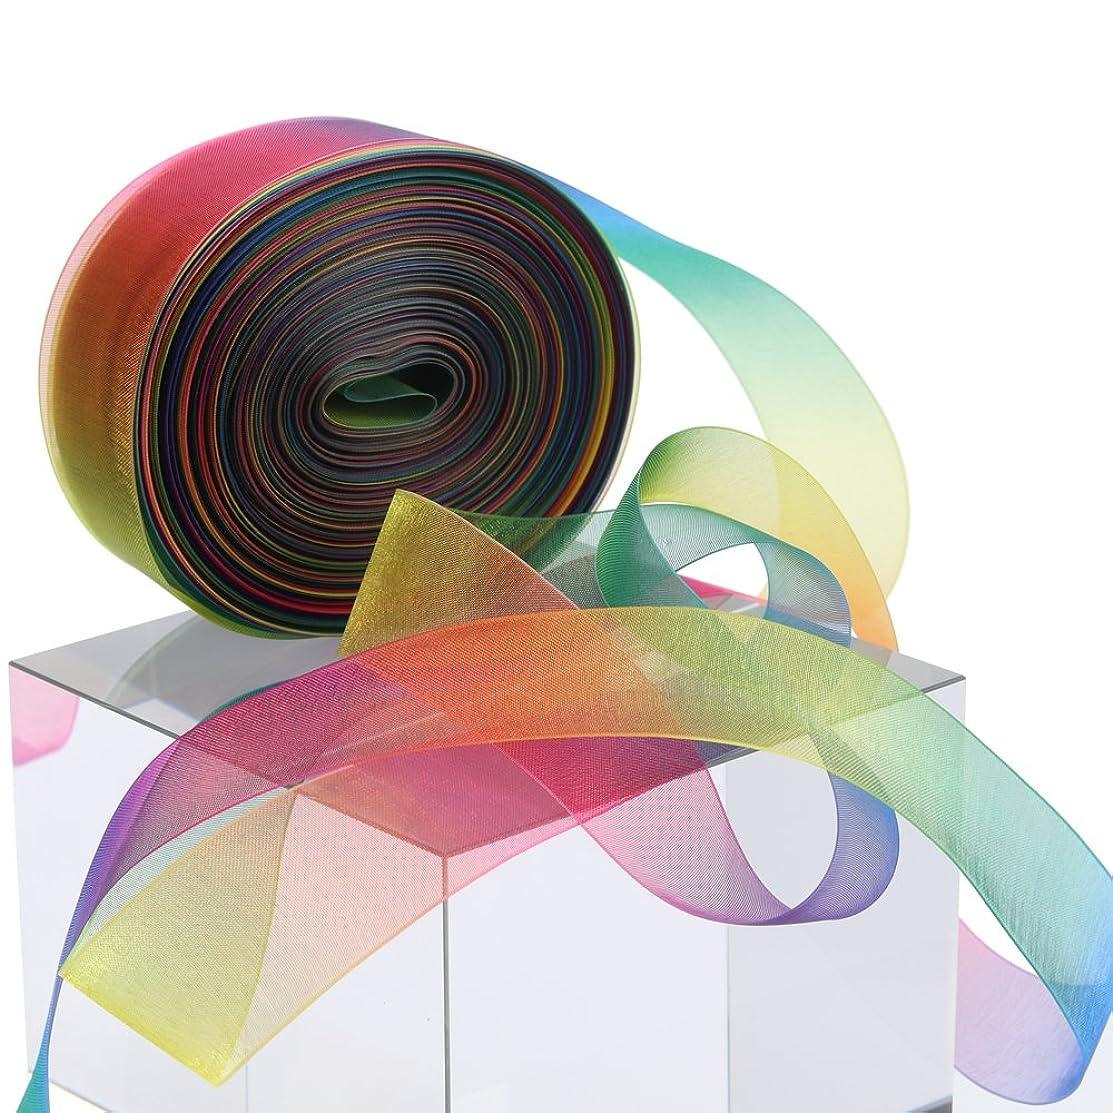 molshine 50yd 1-inch Premium Quality Shimmer Sheer Organza Ribbon - Rainbow Seven Colors